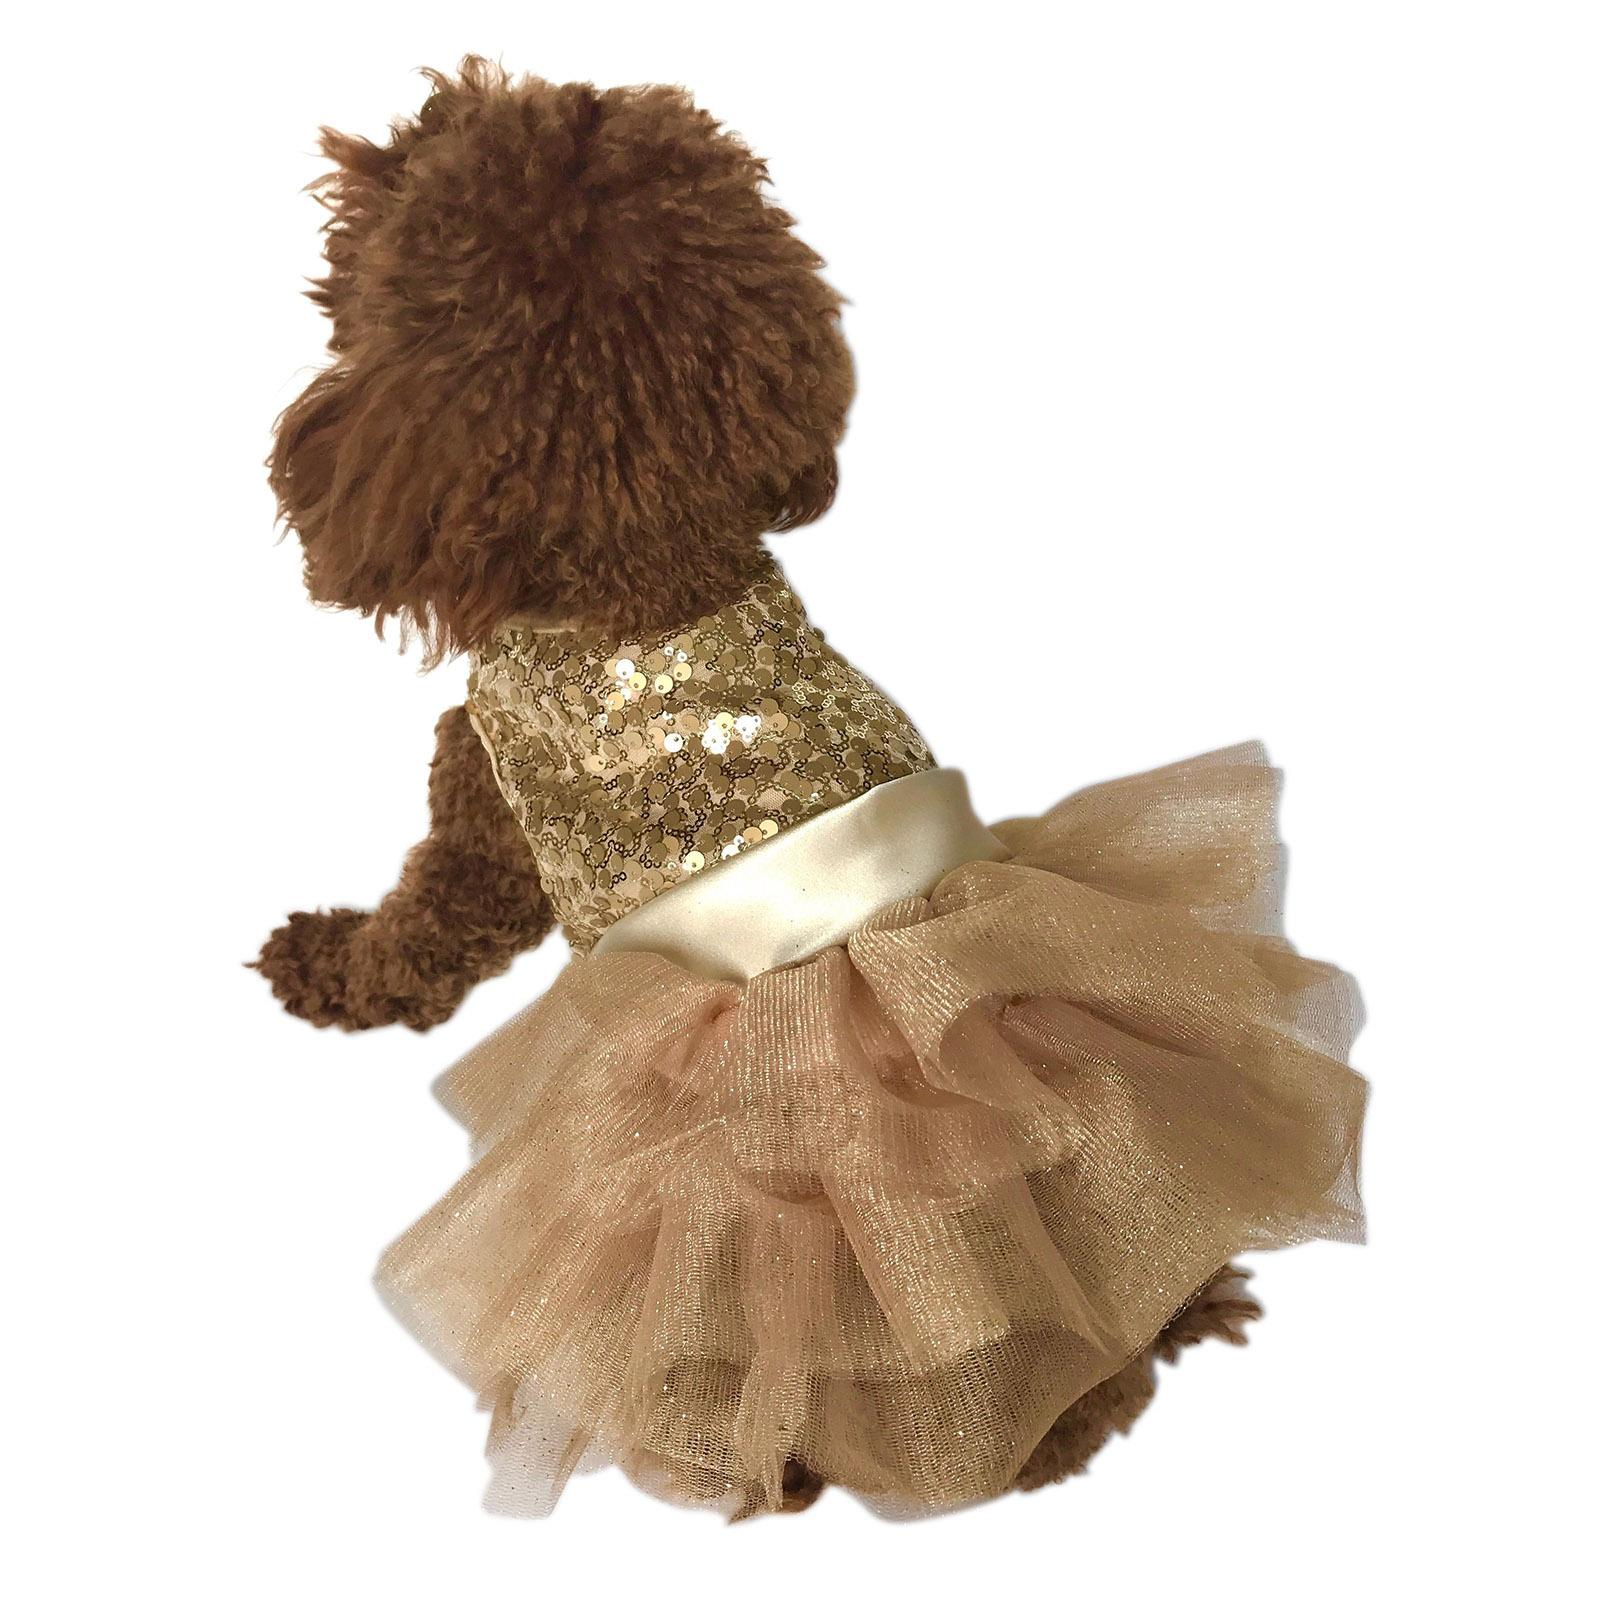 Marilyn Sequin Fufu Tutu Dog Dress - Light Gold